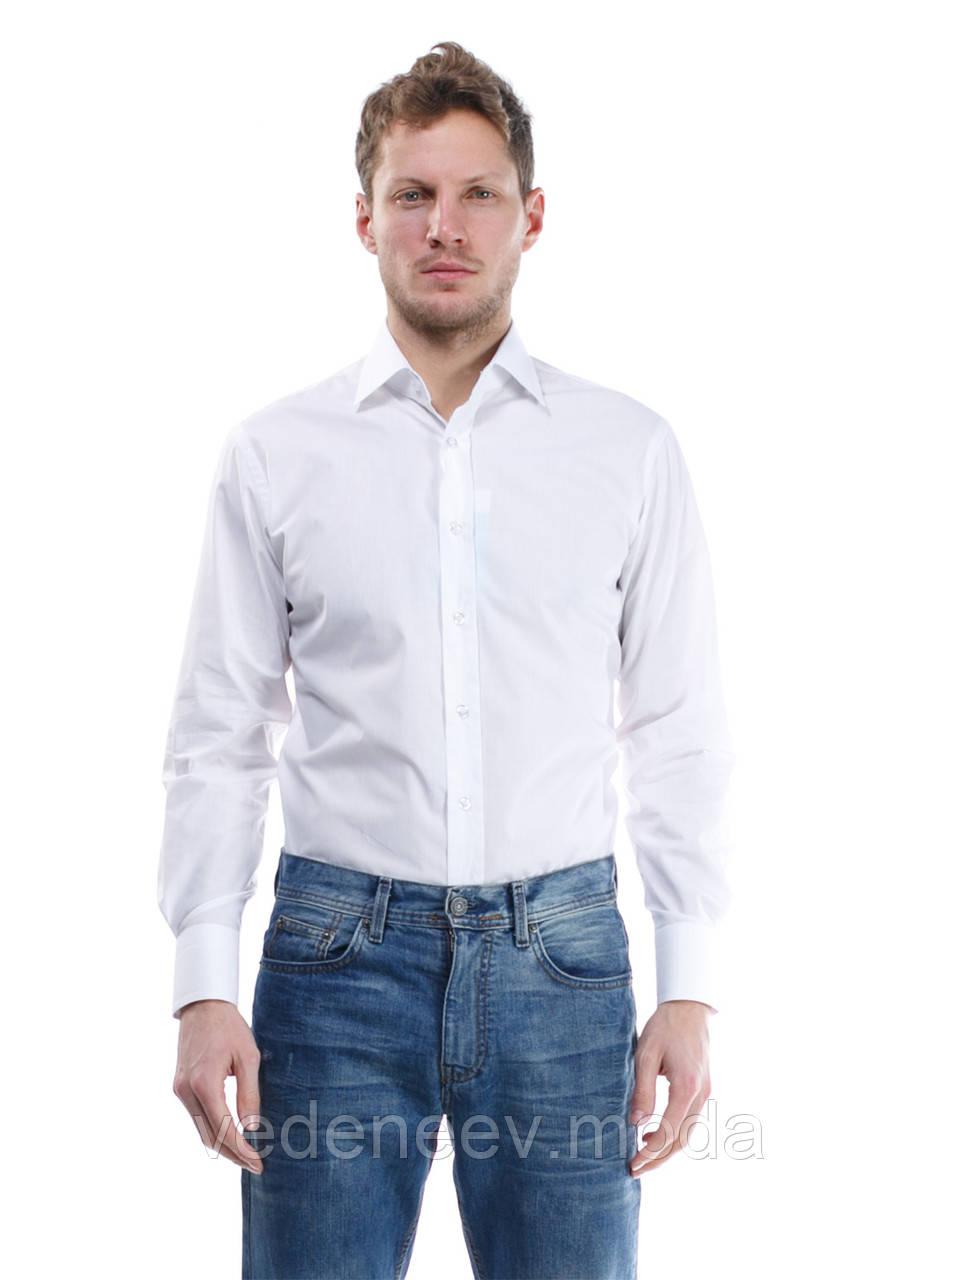 e36a5e230aa Белая приталенная мужская рубашка - Мужские и женские РУБАШКИ для ВСЕХ.